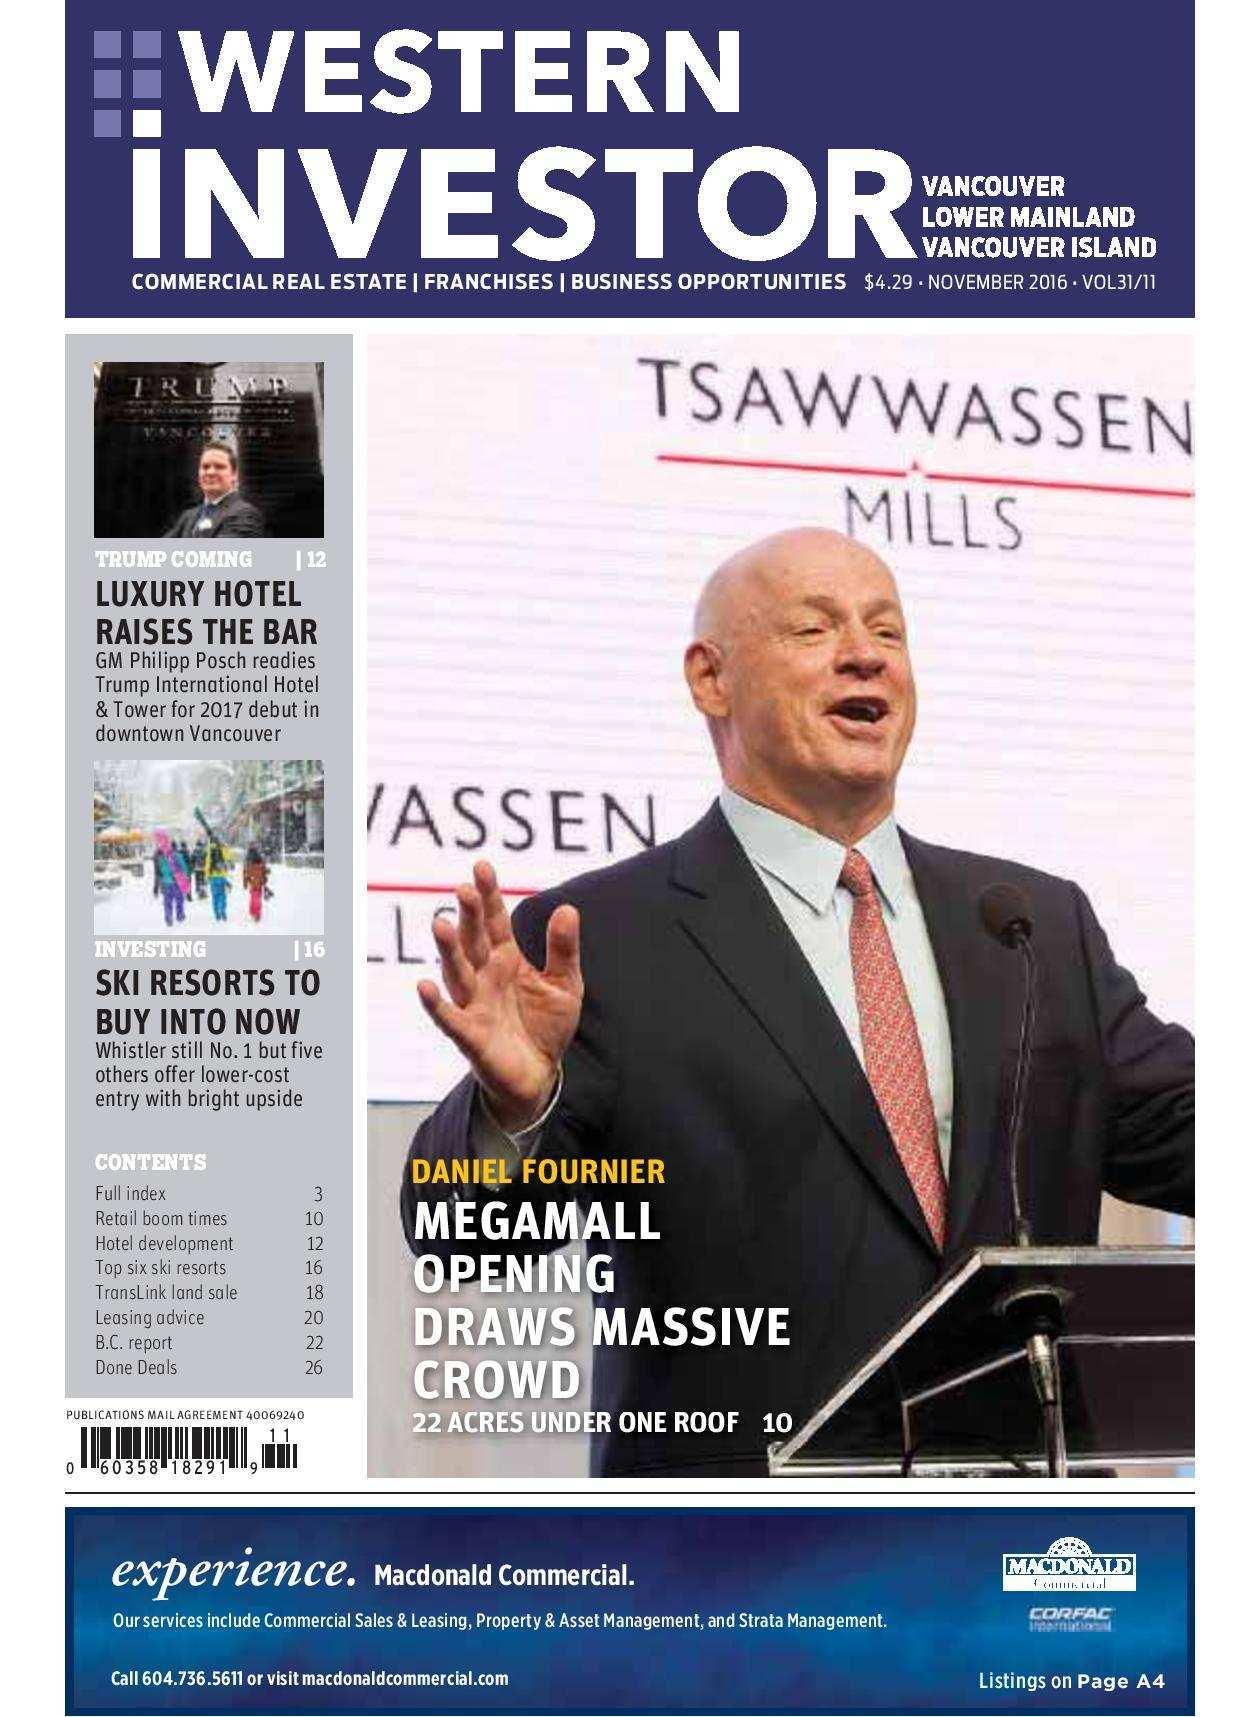 Press Release: Western Investor Ad – Nov 2016